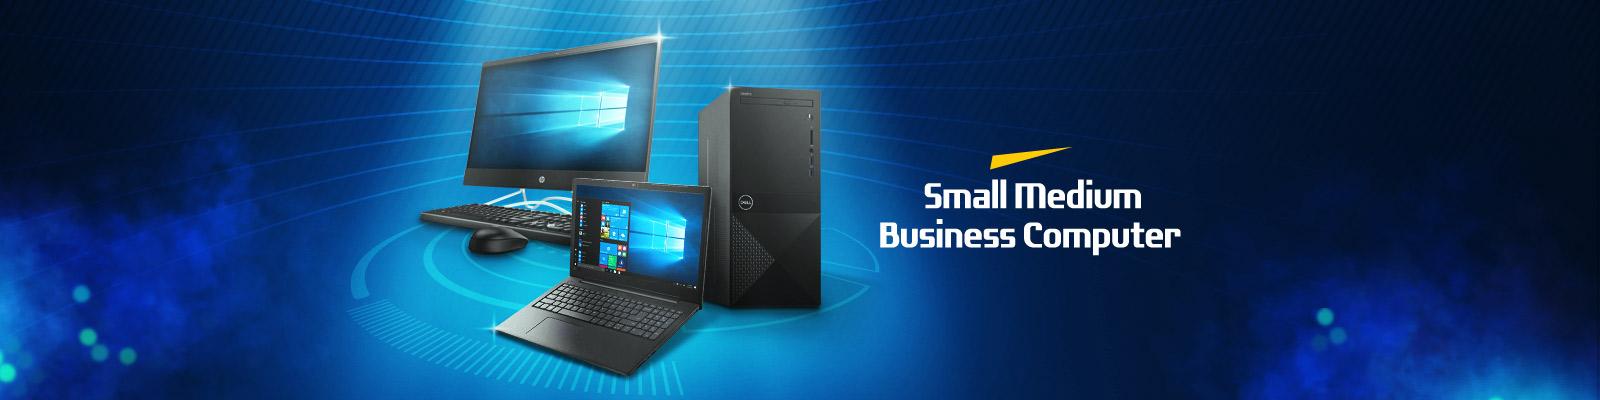 Small Medium Business Computer